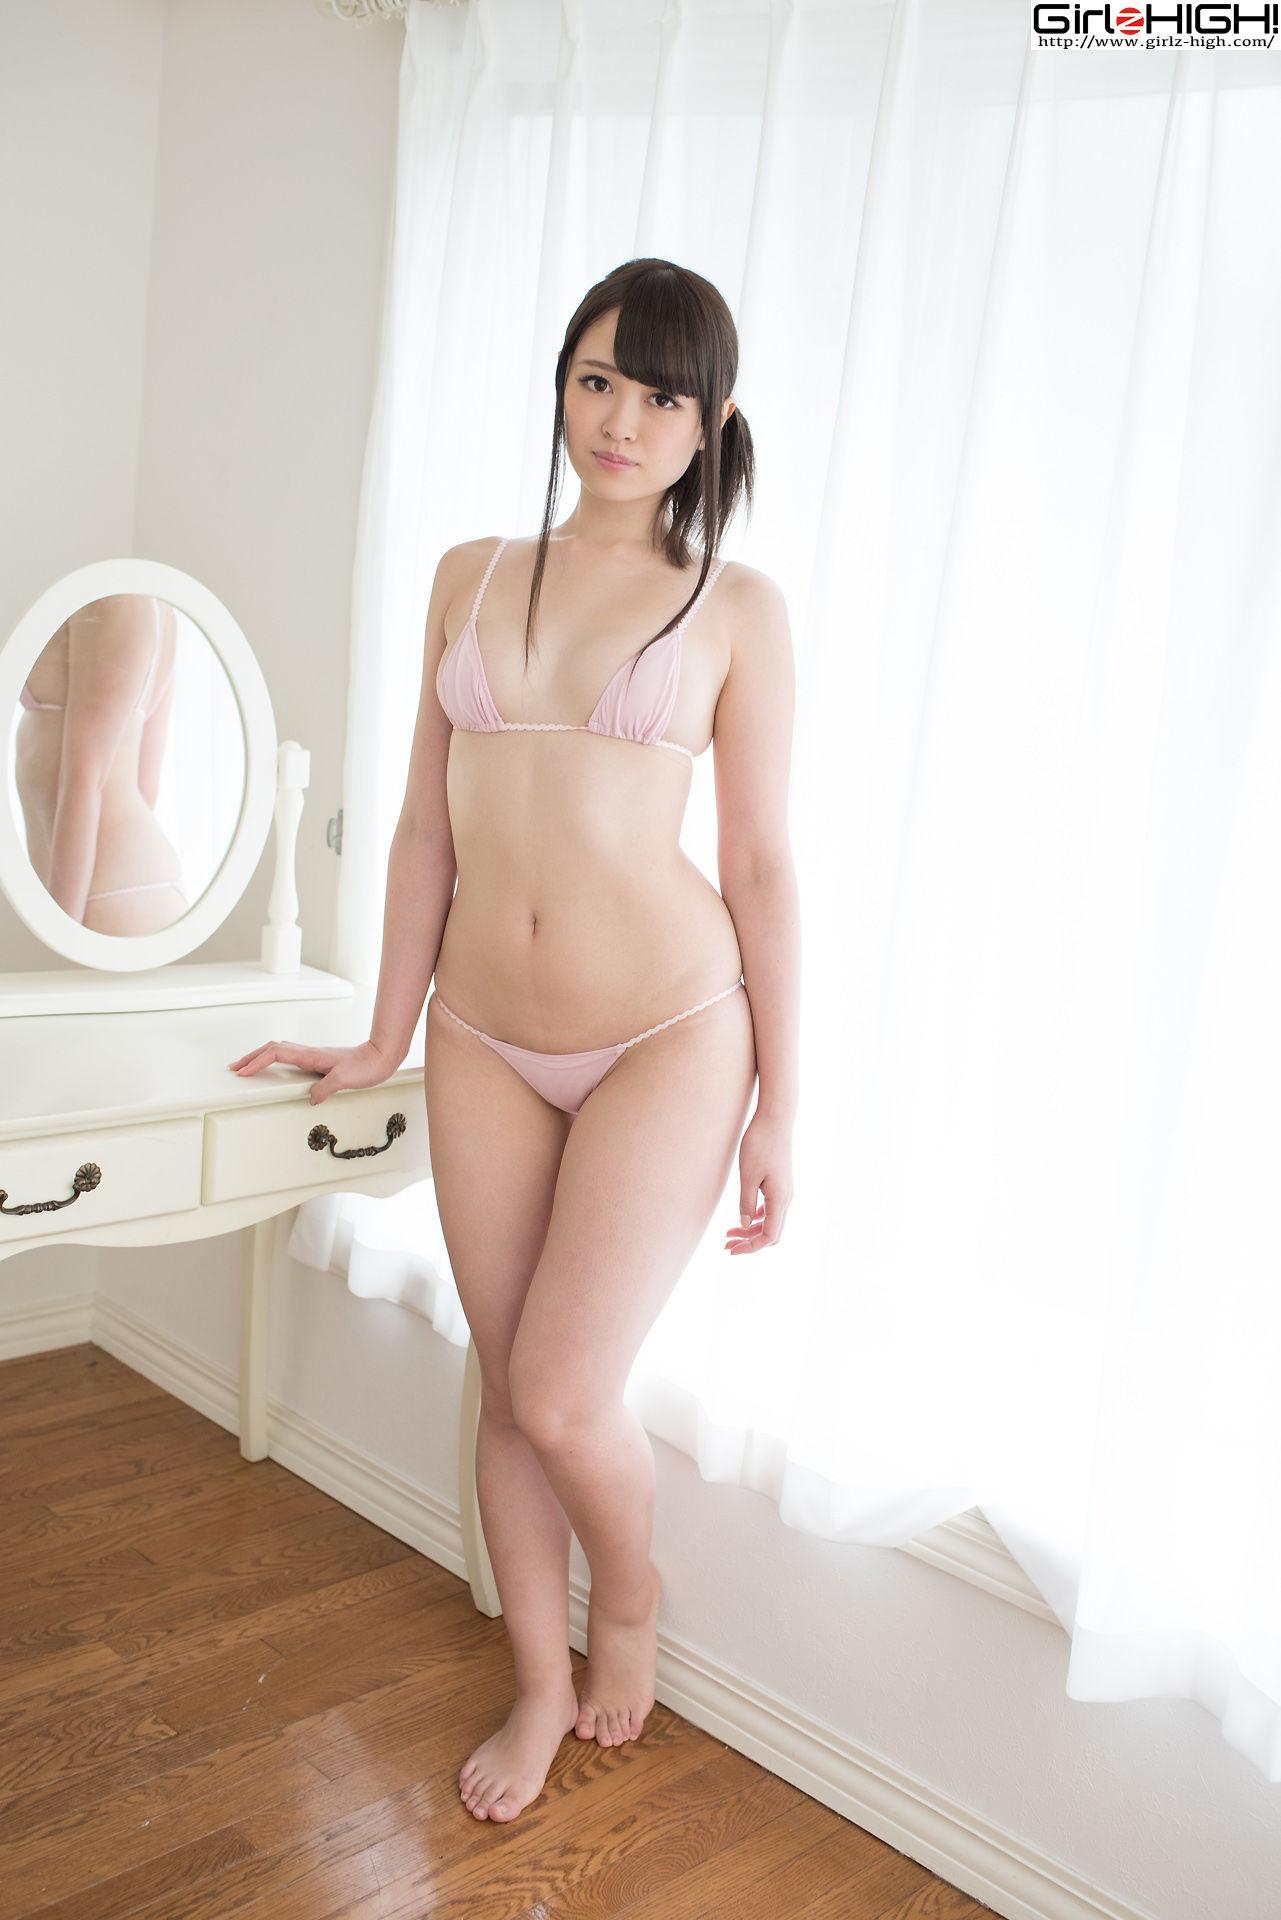 VOL.278 [Girlz-High]粉嫩美乳日本萌妹子:葉山みおり超高清写真套图(50P)